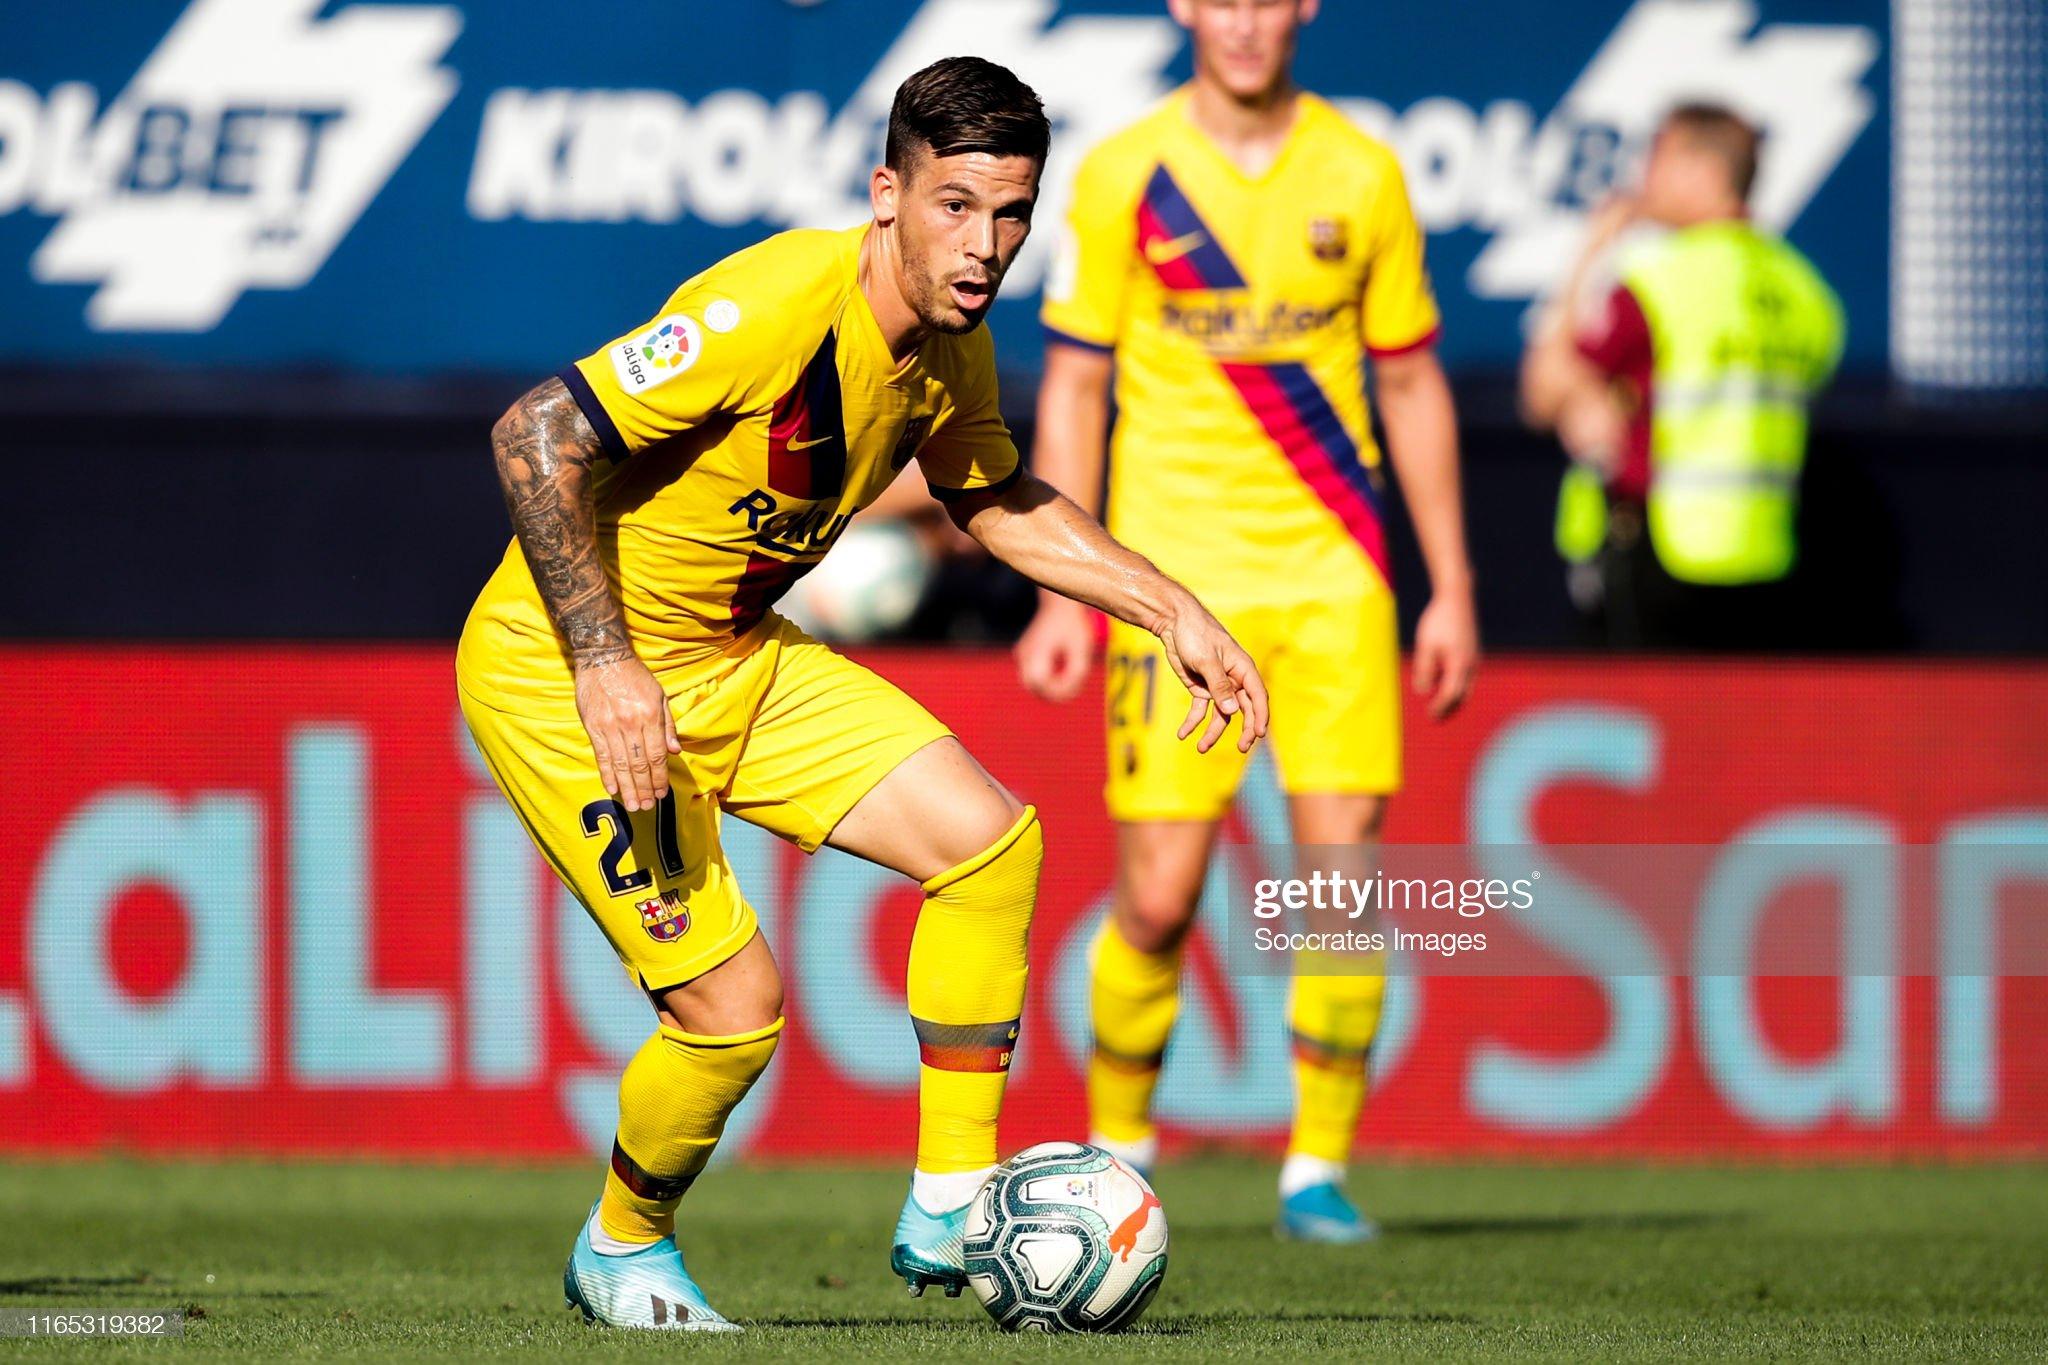 صور مباراة : أوساسونا - برشلونة 2-2 ( 31-08-2019 )  Carles-perez-of-fc-barcelona-during-the-la-liga-santander-match-v-picture-id1165319382?s=2048x2048